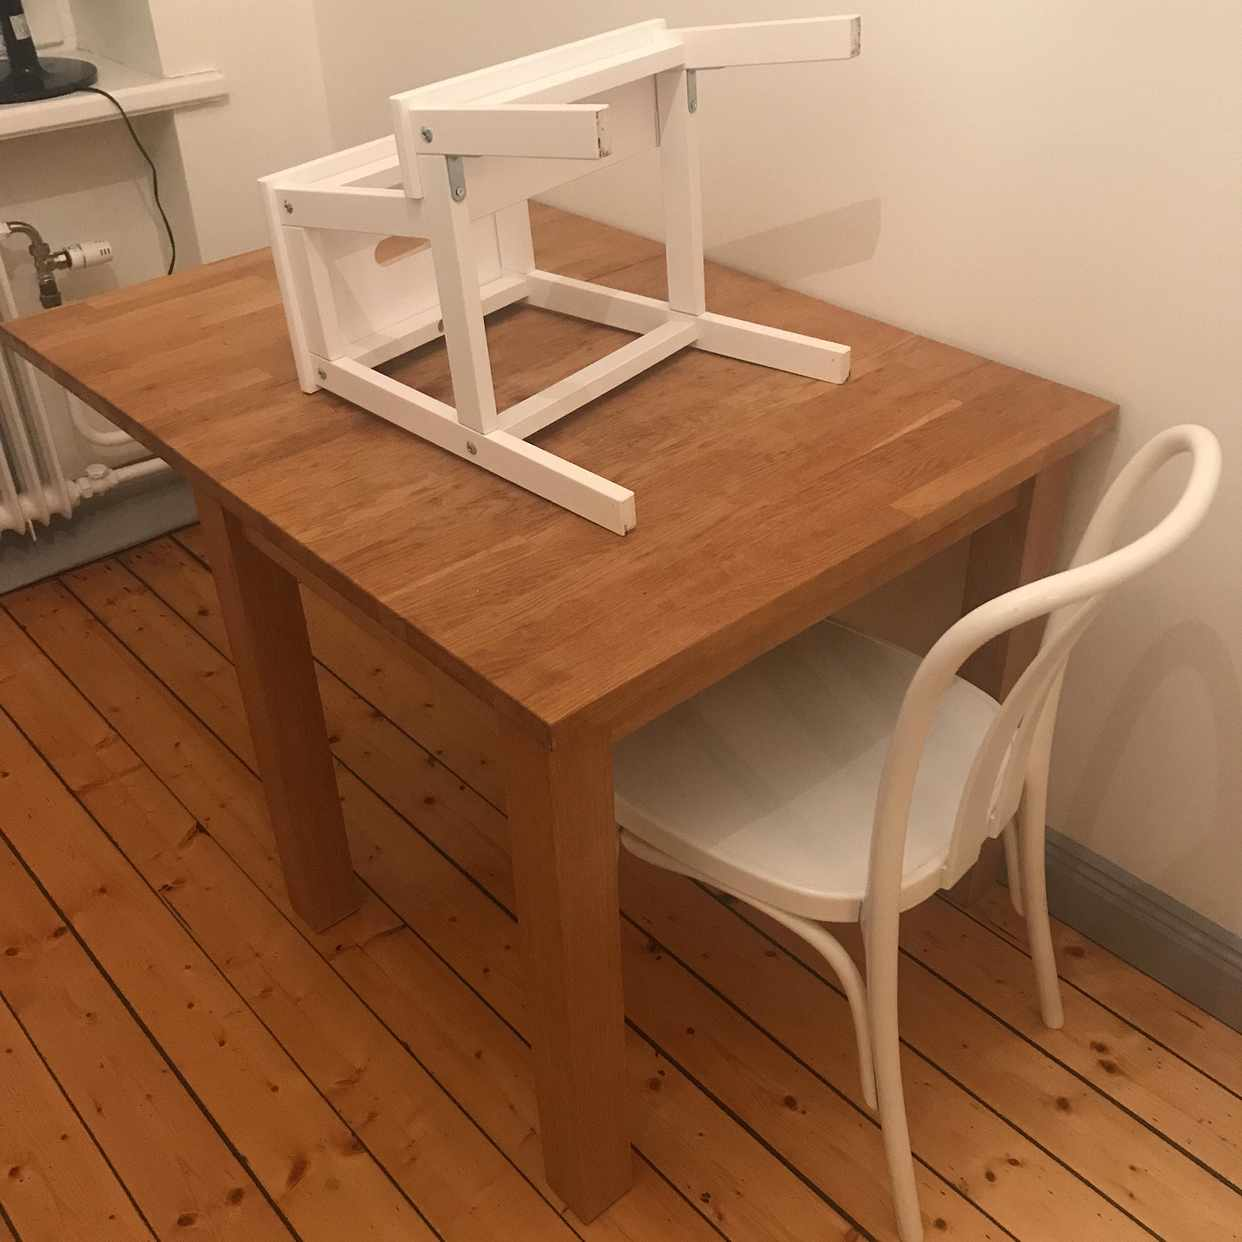 image of 1 Matbord 1 stol 1 pall - Hägersten